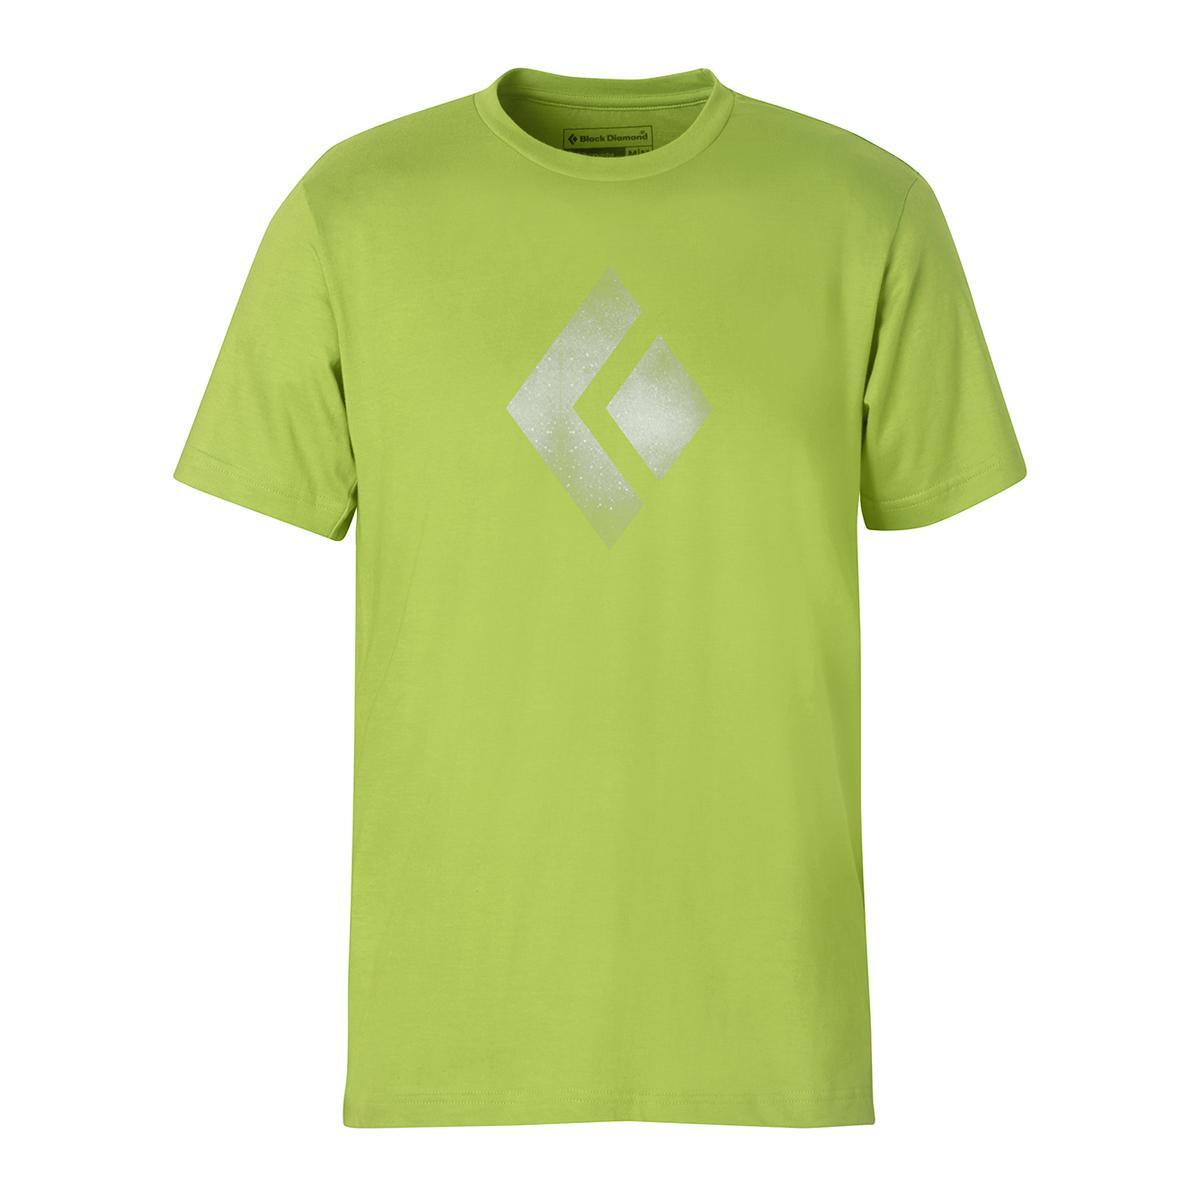 Black diamond chalked up tee t shirts shirts tops for Diamond and silk t shirts